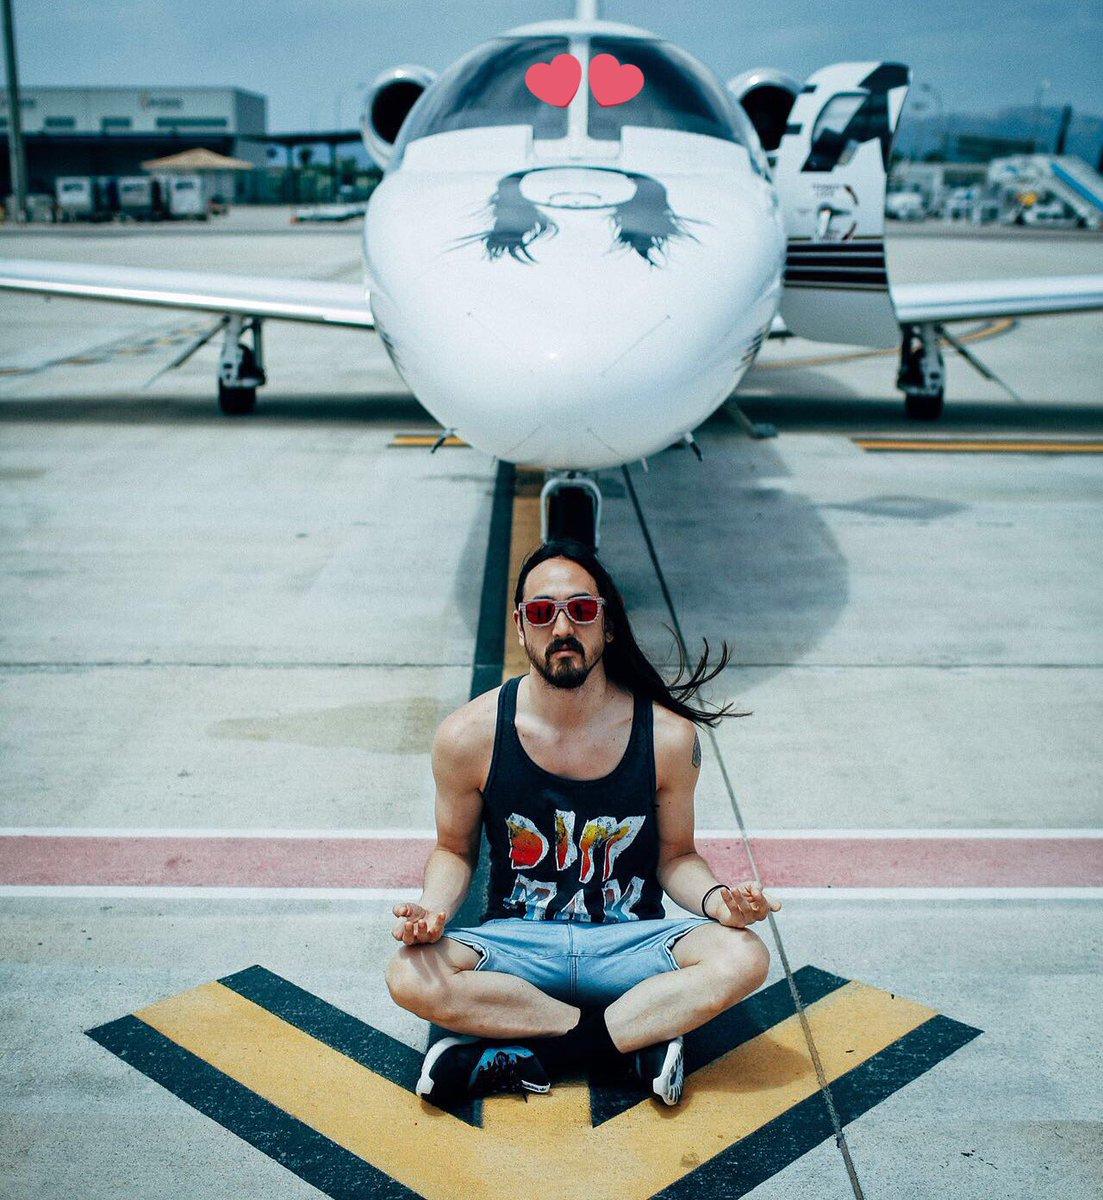 #zenaoki #30. The #AokiJet #ILYSM day of release zen vibes. Mallorca Airport. July 8, 2016.